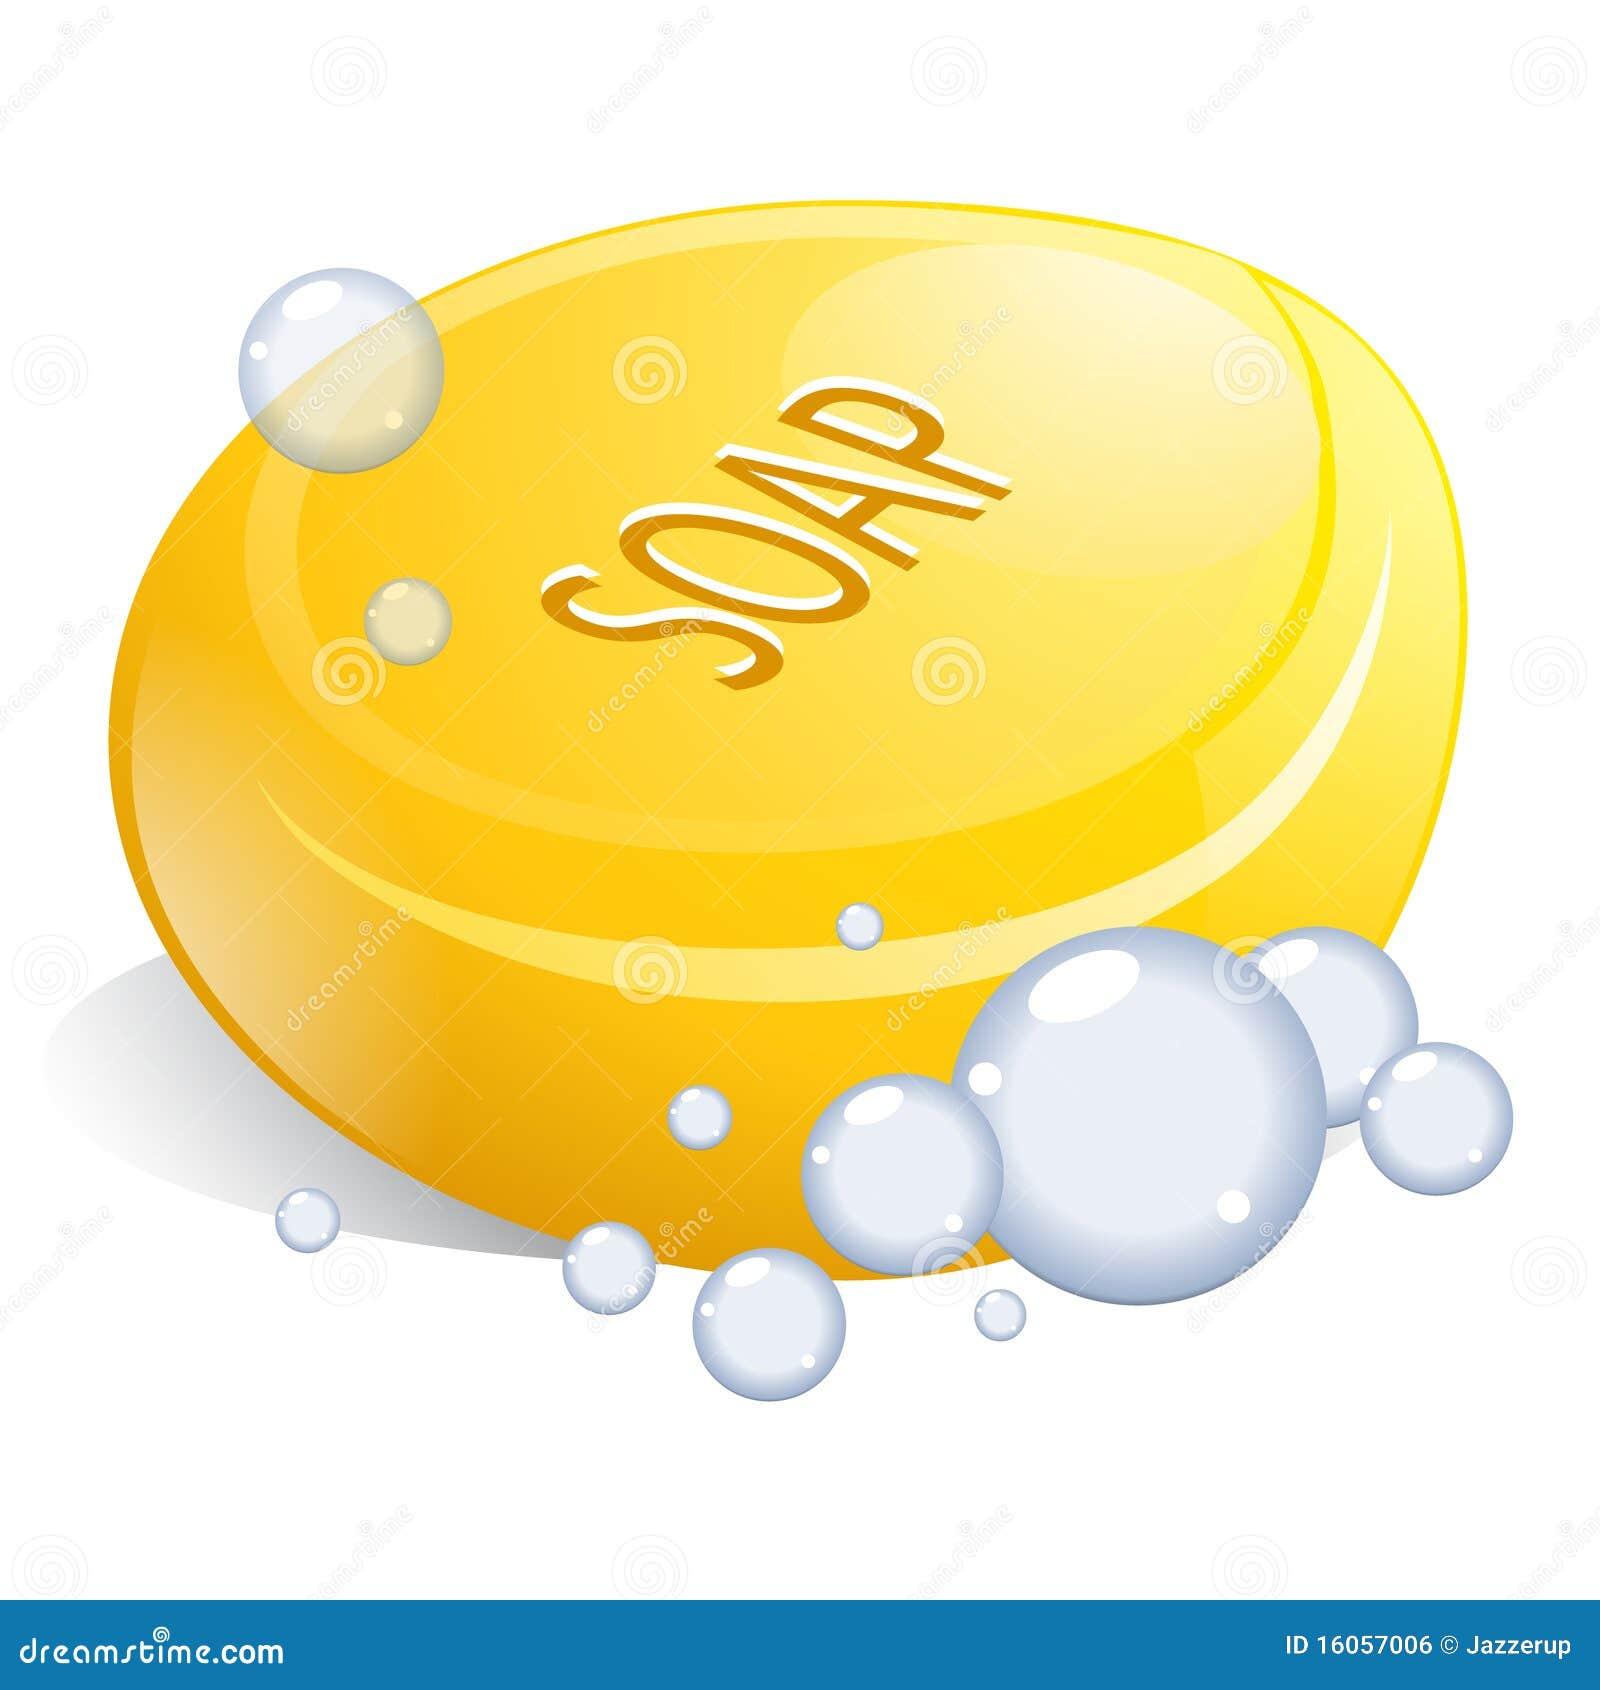 soap royalty free stock image image 16057006